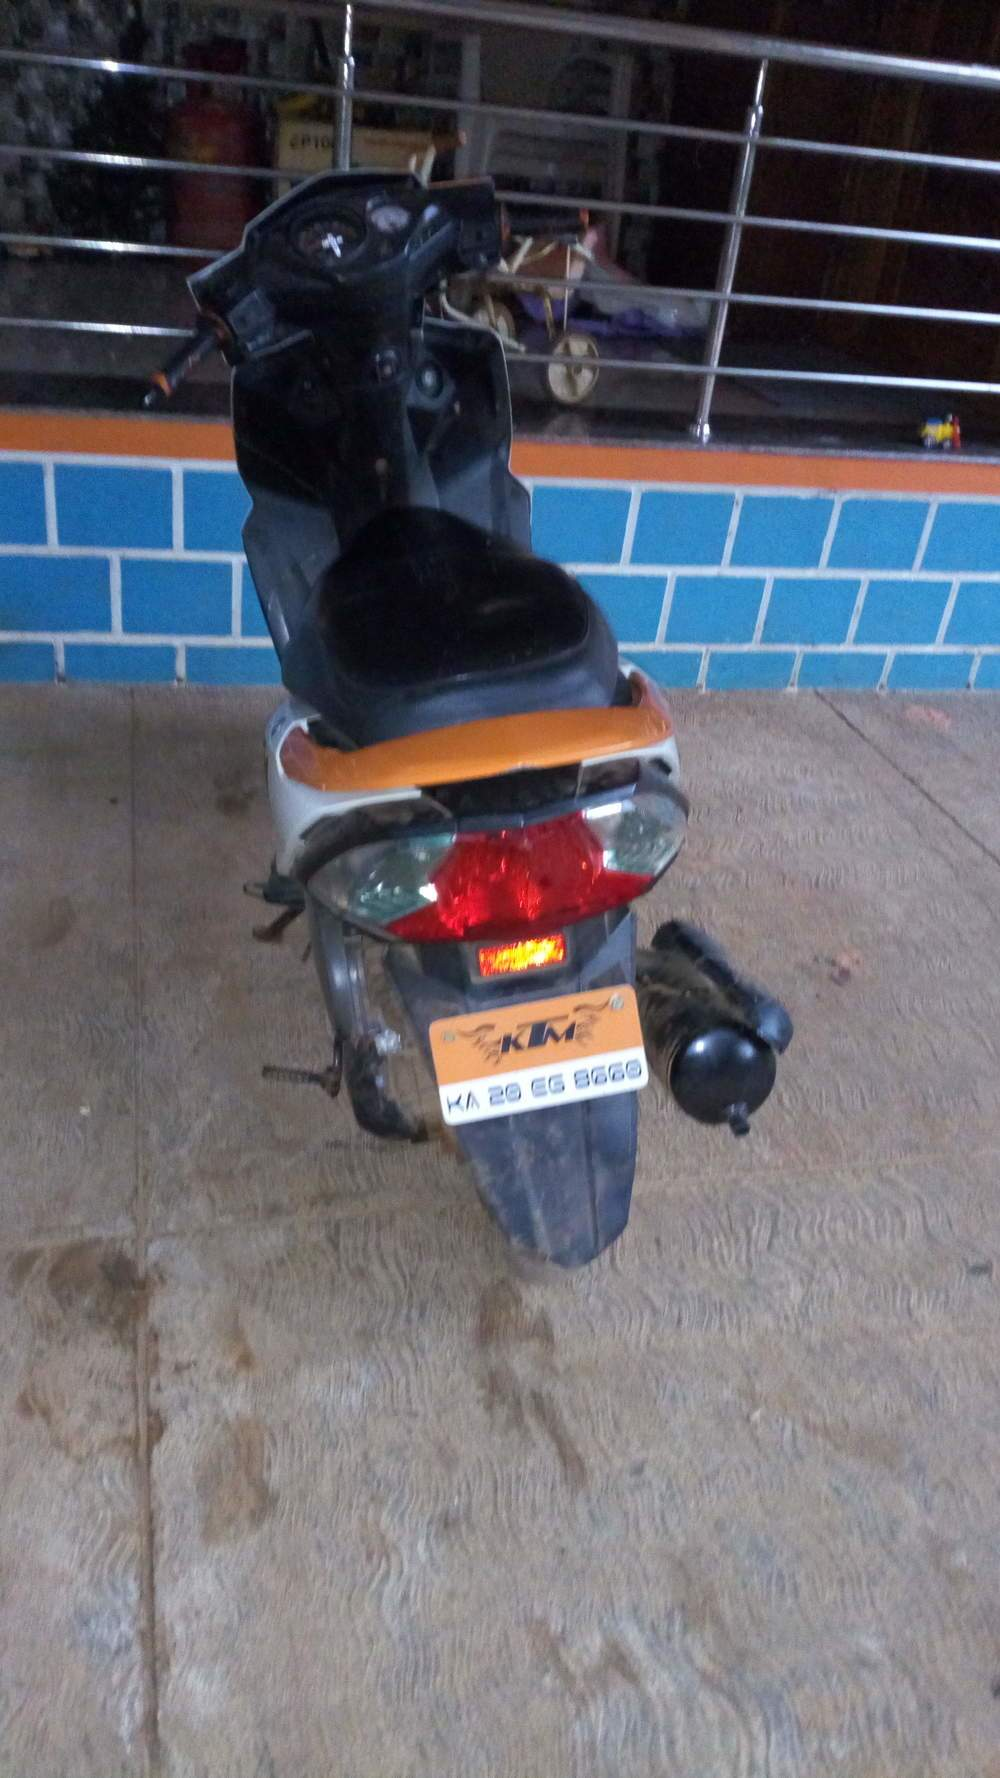 Honda Dio Rim Stickers Satu Sticker Bike Design Spedy Red Reflecting For Source Used In Udupi 2014 Model India At Best Price Id 2678